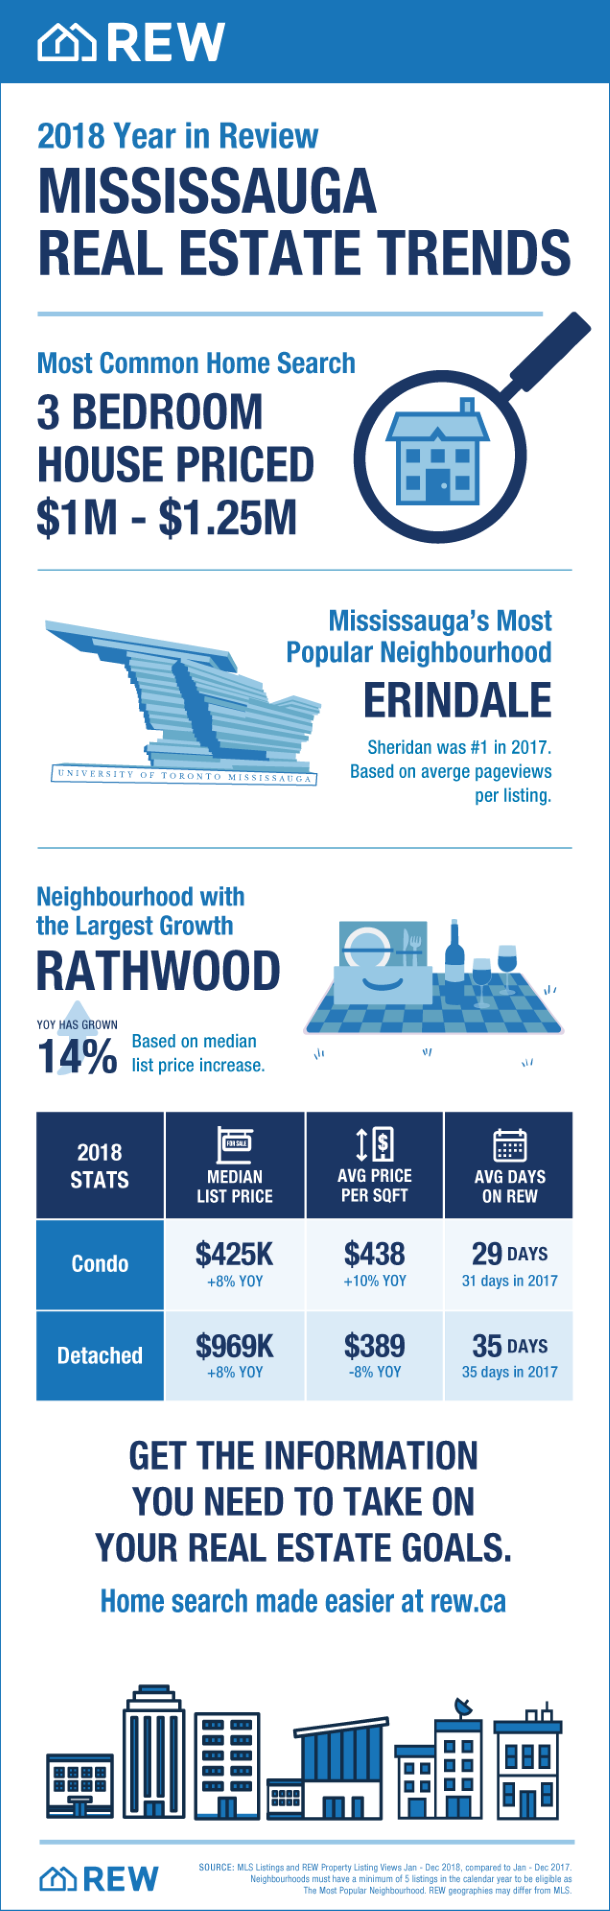 Mississauga Real Estate Trends 2018